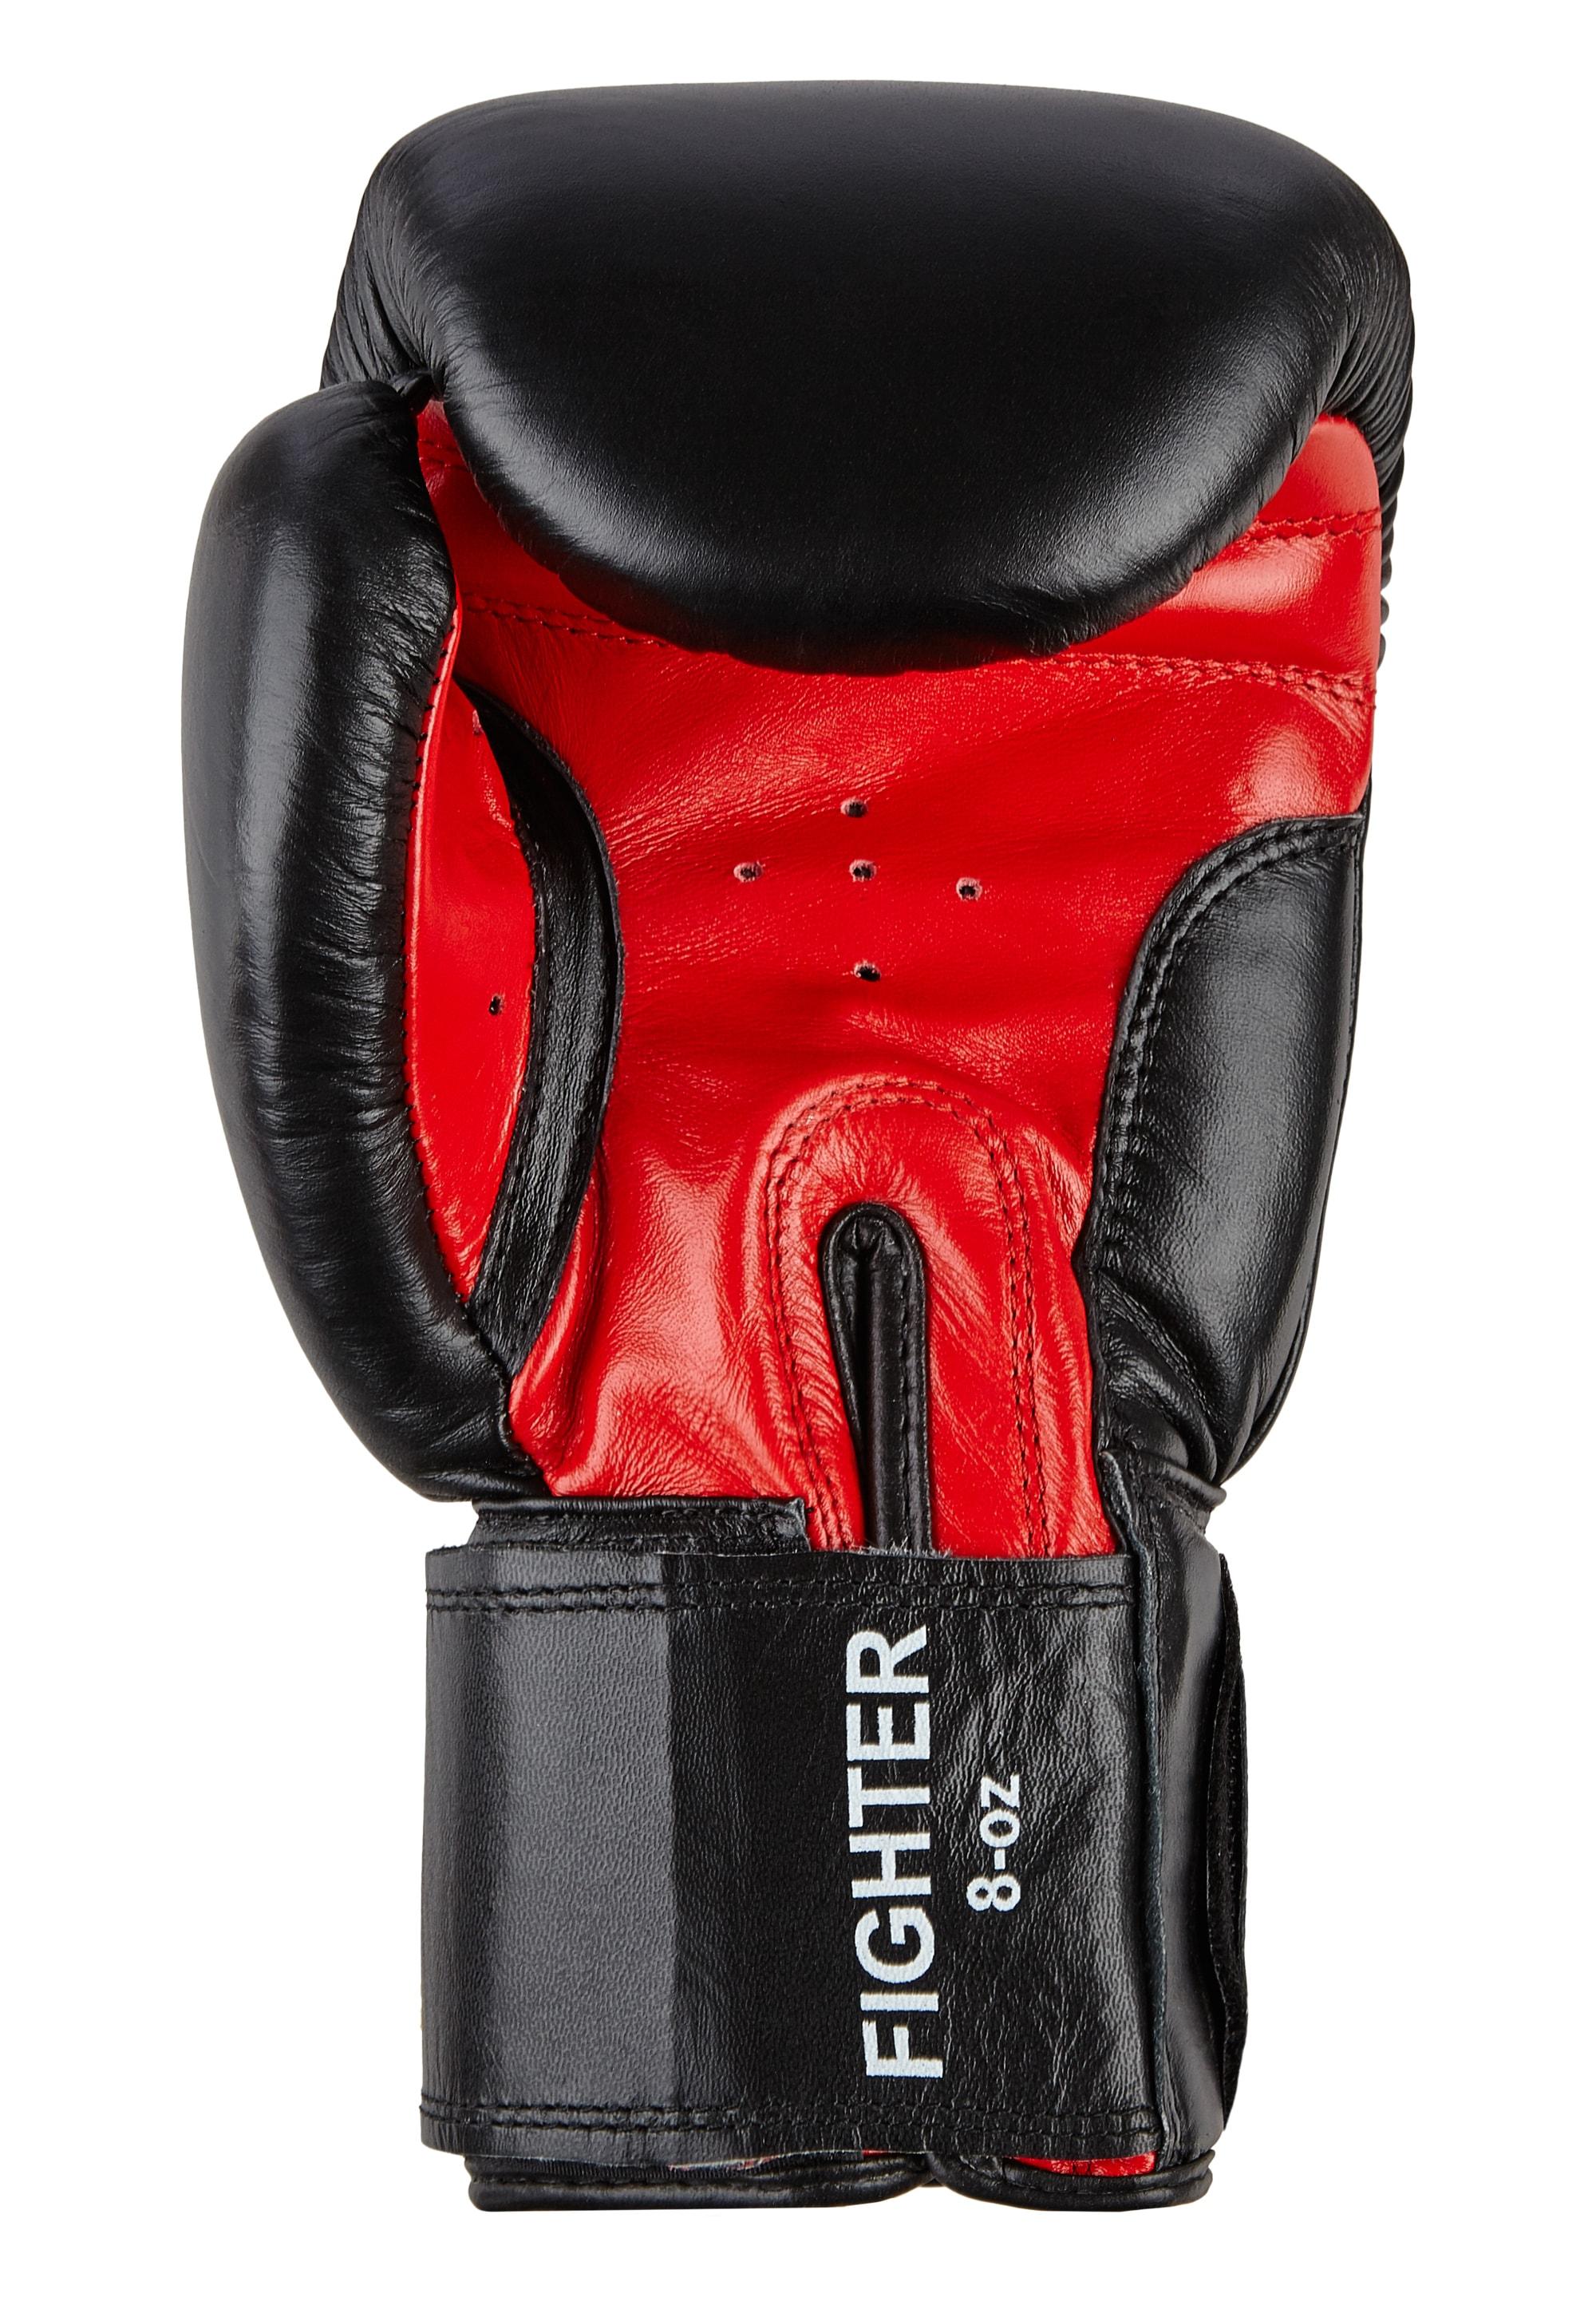 Benlee Rocky Marciano Handschuhe in sportlichem Design FIGHTER | Accessoires > Handschuhe > Sonstige Handschuhe | Benlee Rocky Marciano